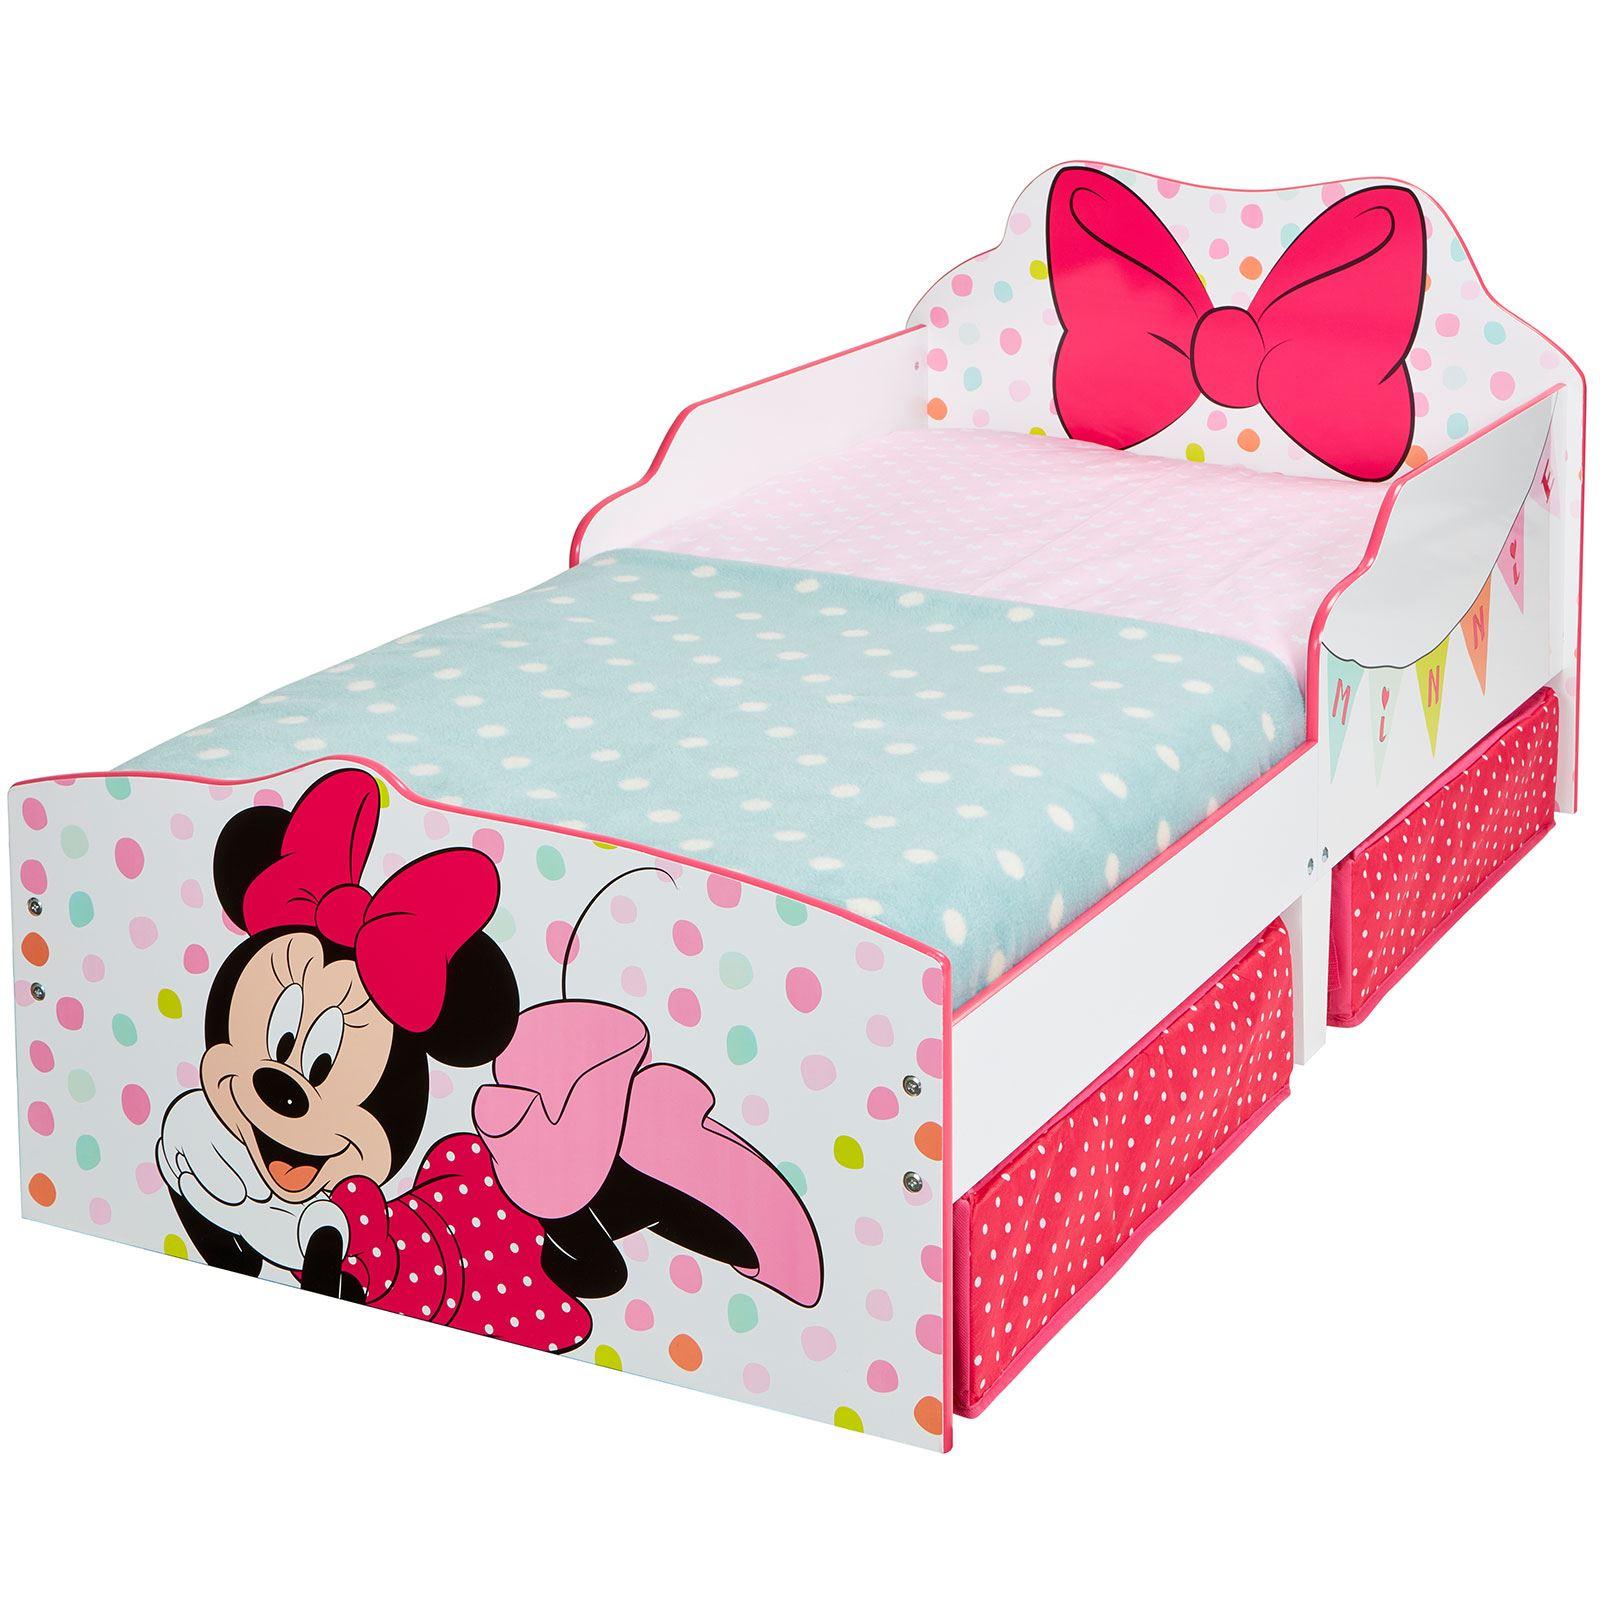 disney lit enfant b b avec rangement matelas cars peppa minnie ebay. Black Bedroom Furniture Sets. Home Design Ideas